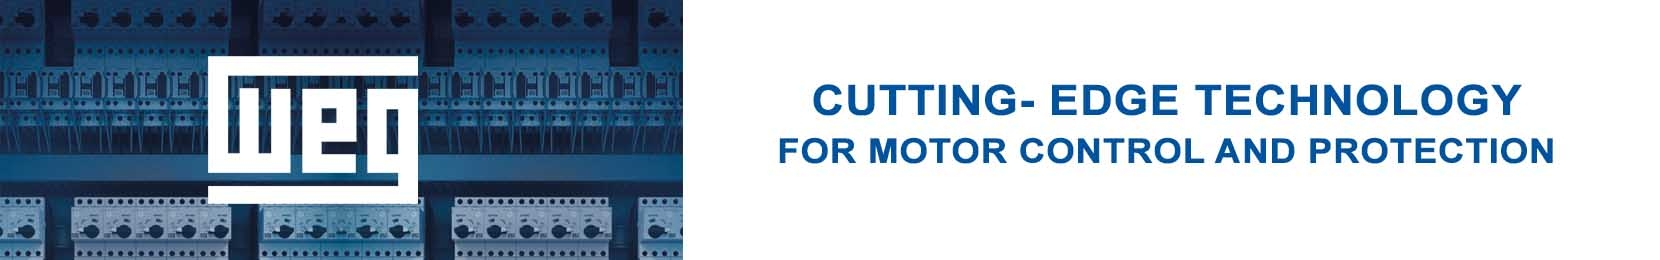 weg-motorcontrol-banner